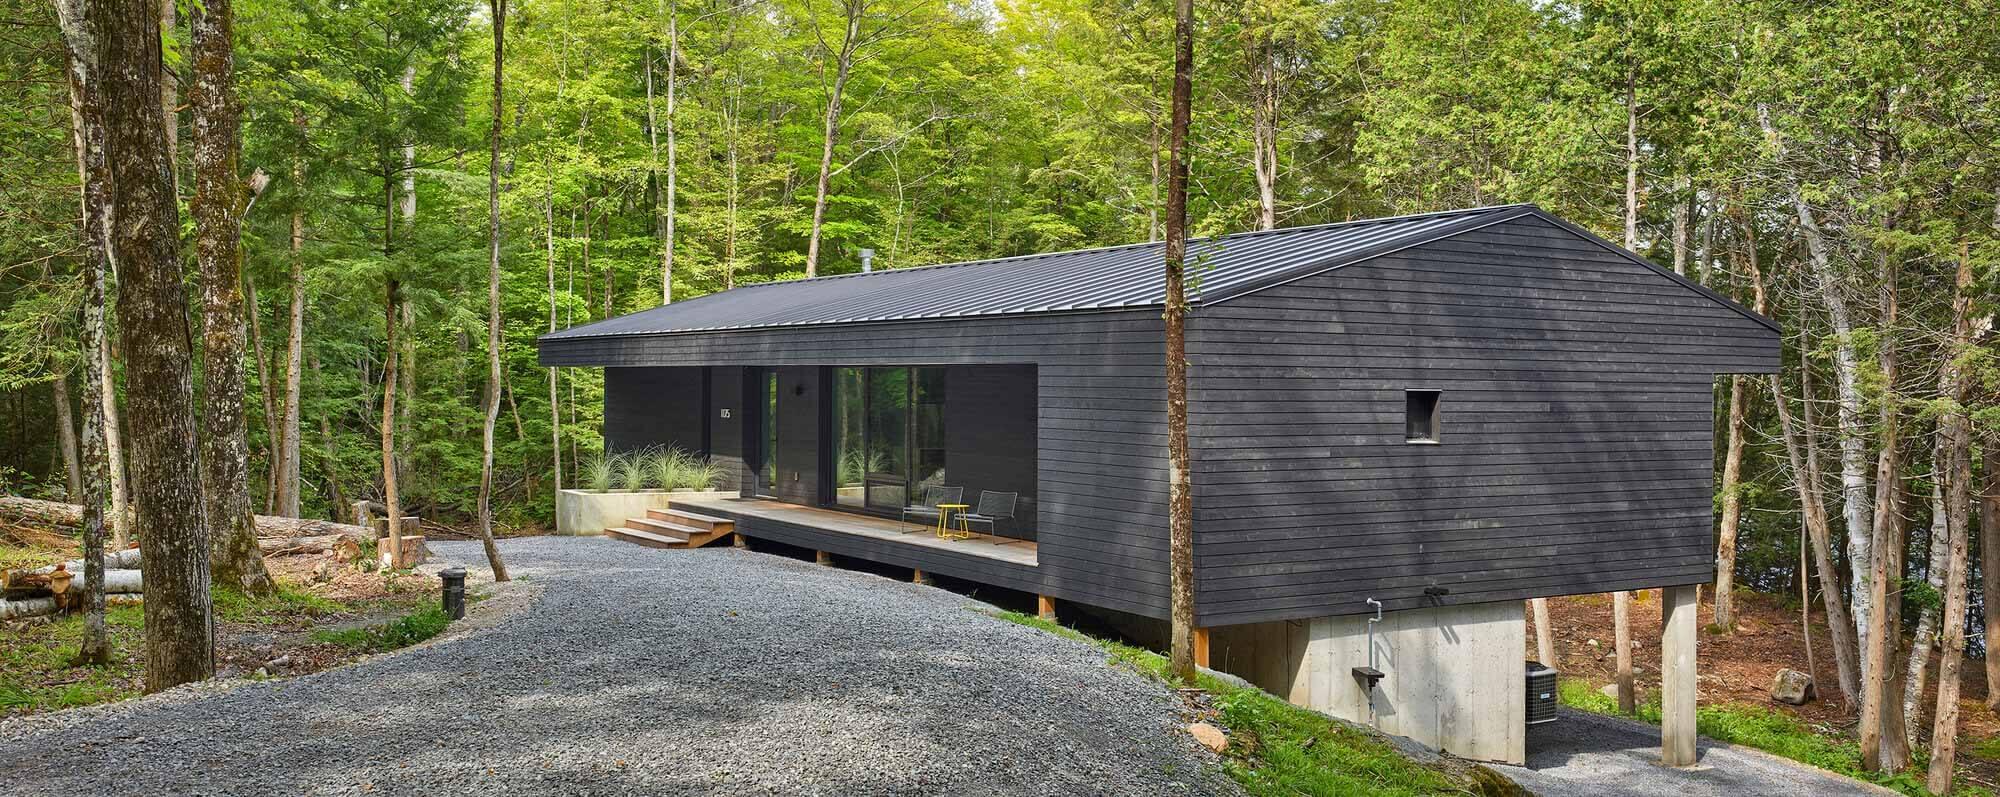 Kennebec Lakehouse / Zerafa Studio